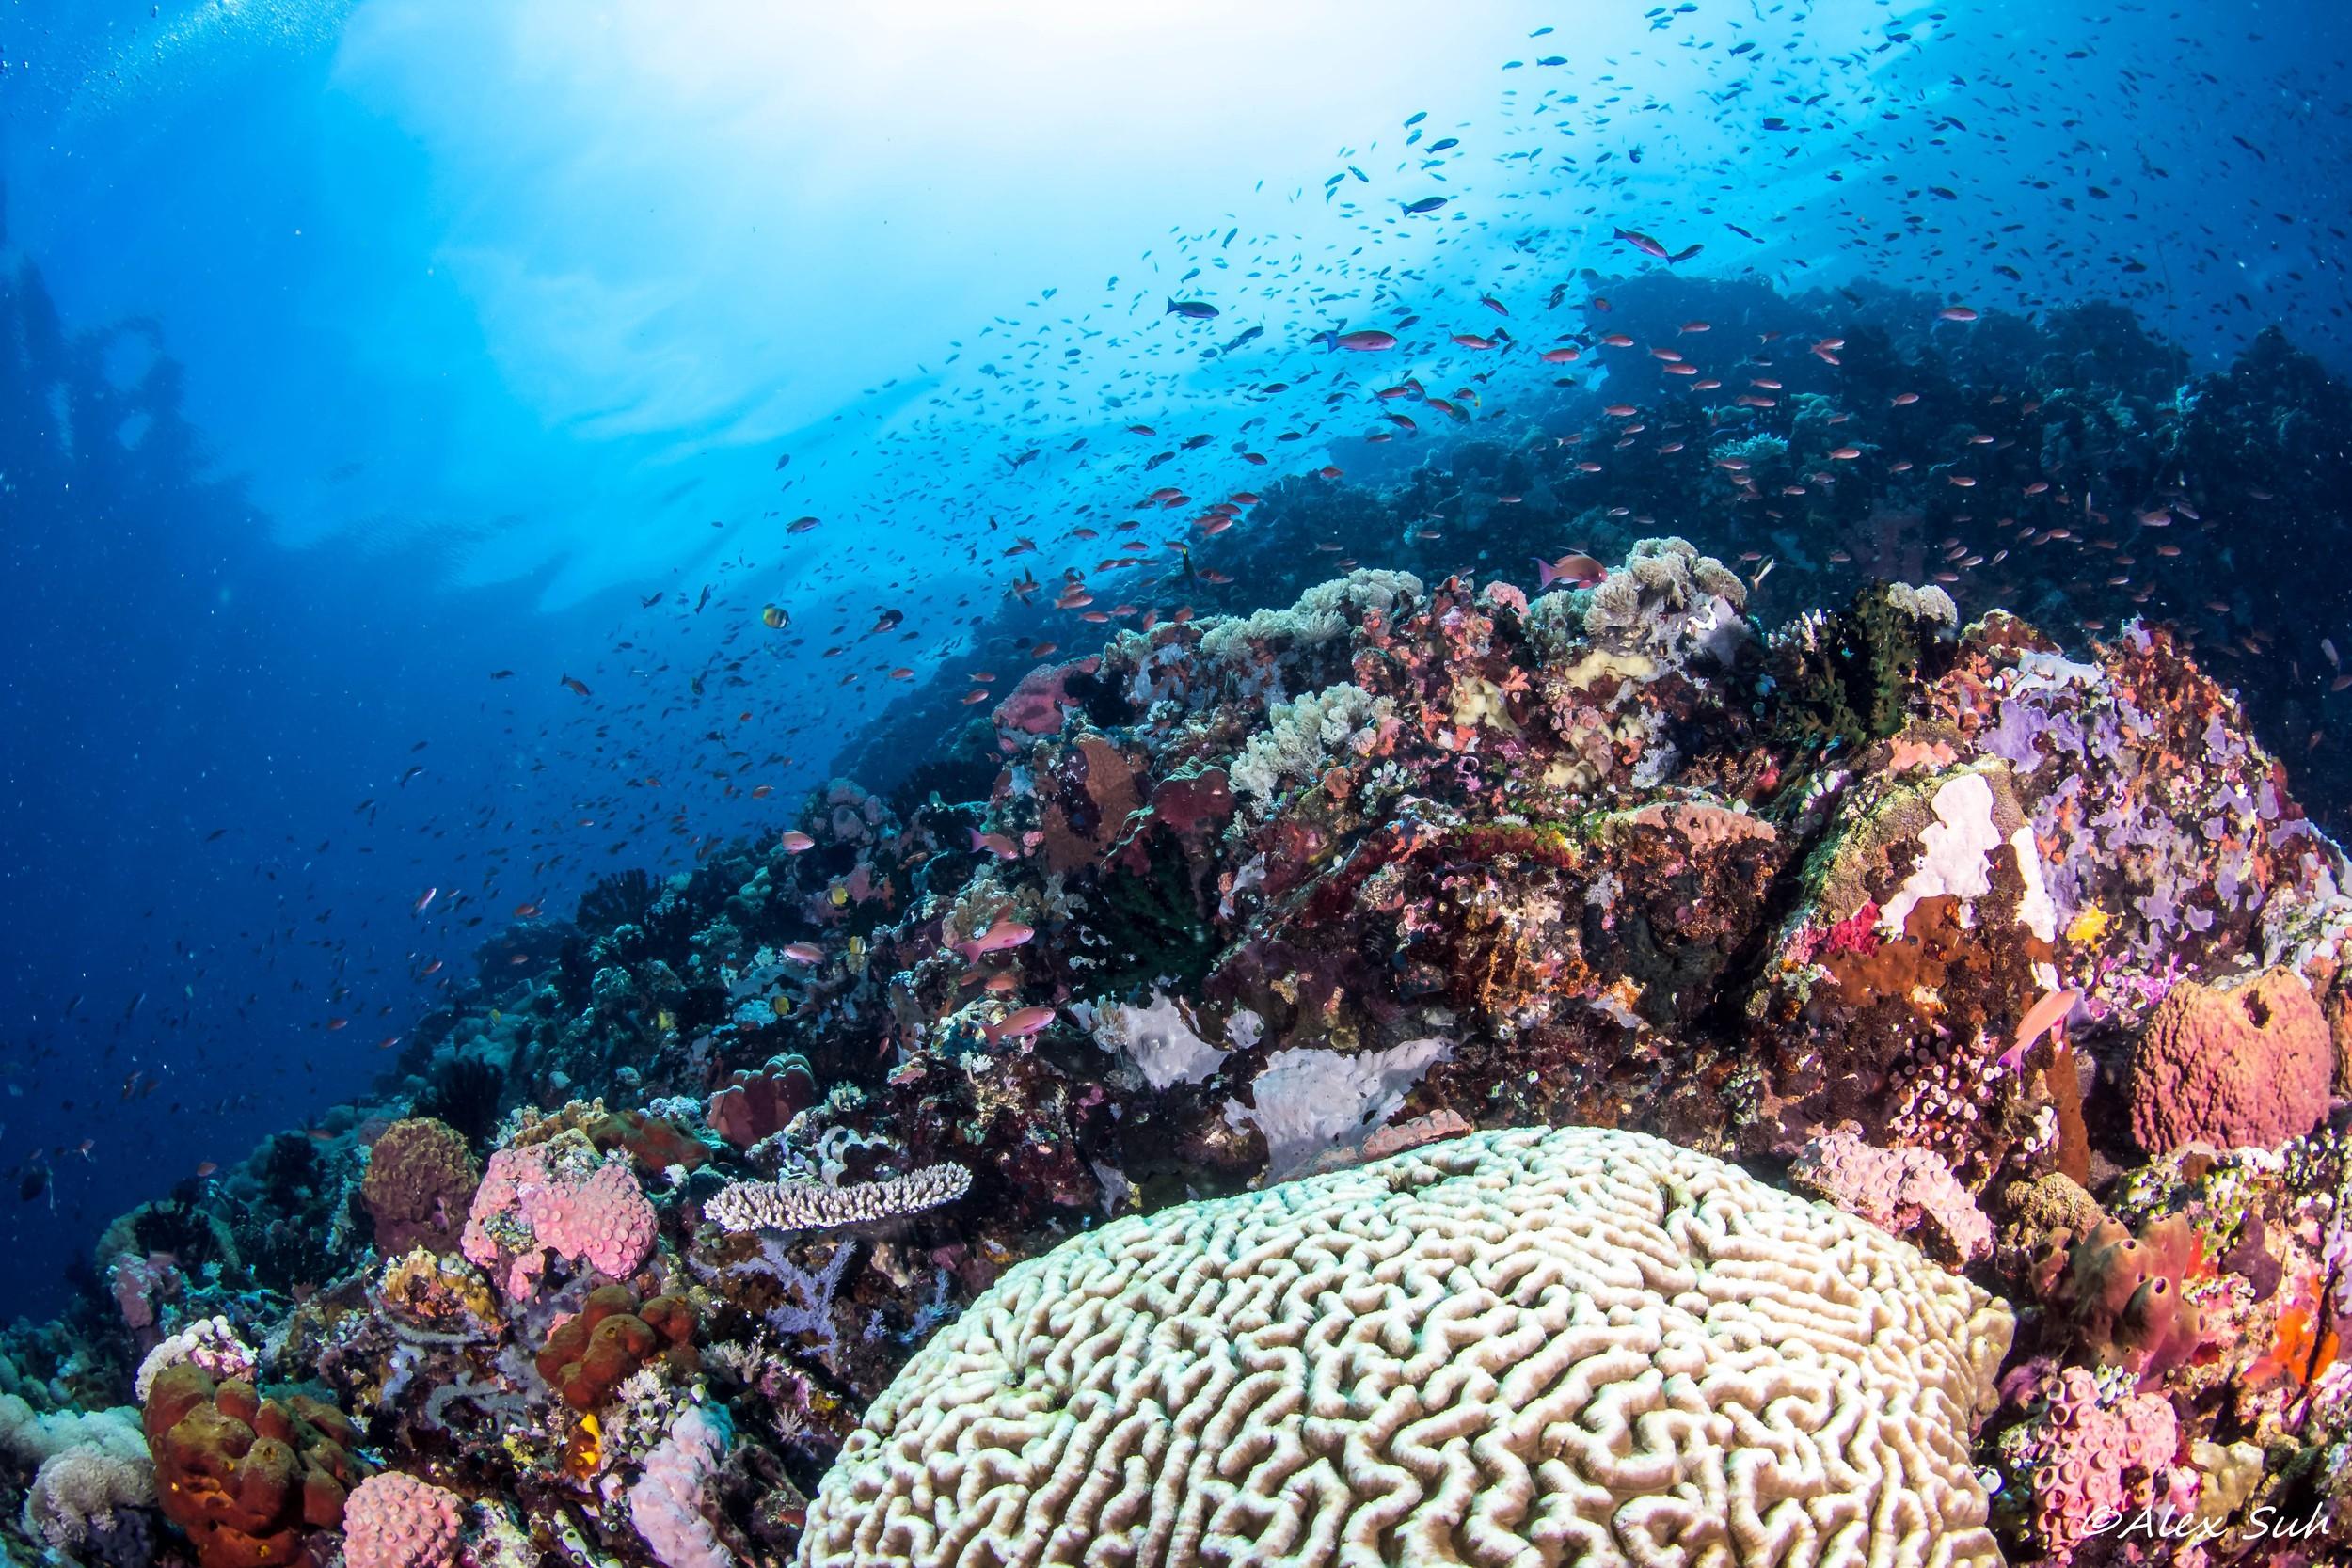 Coral Reef & Brain Coral